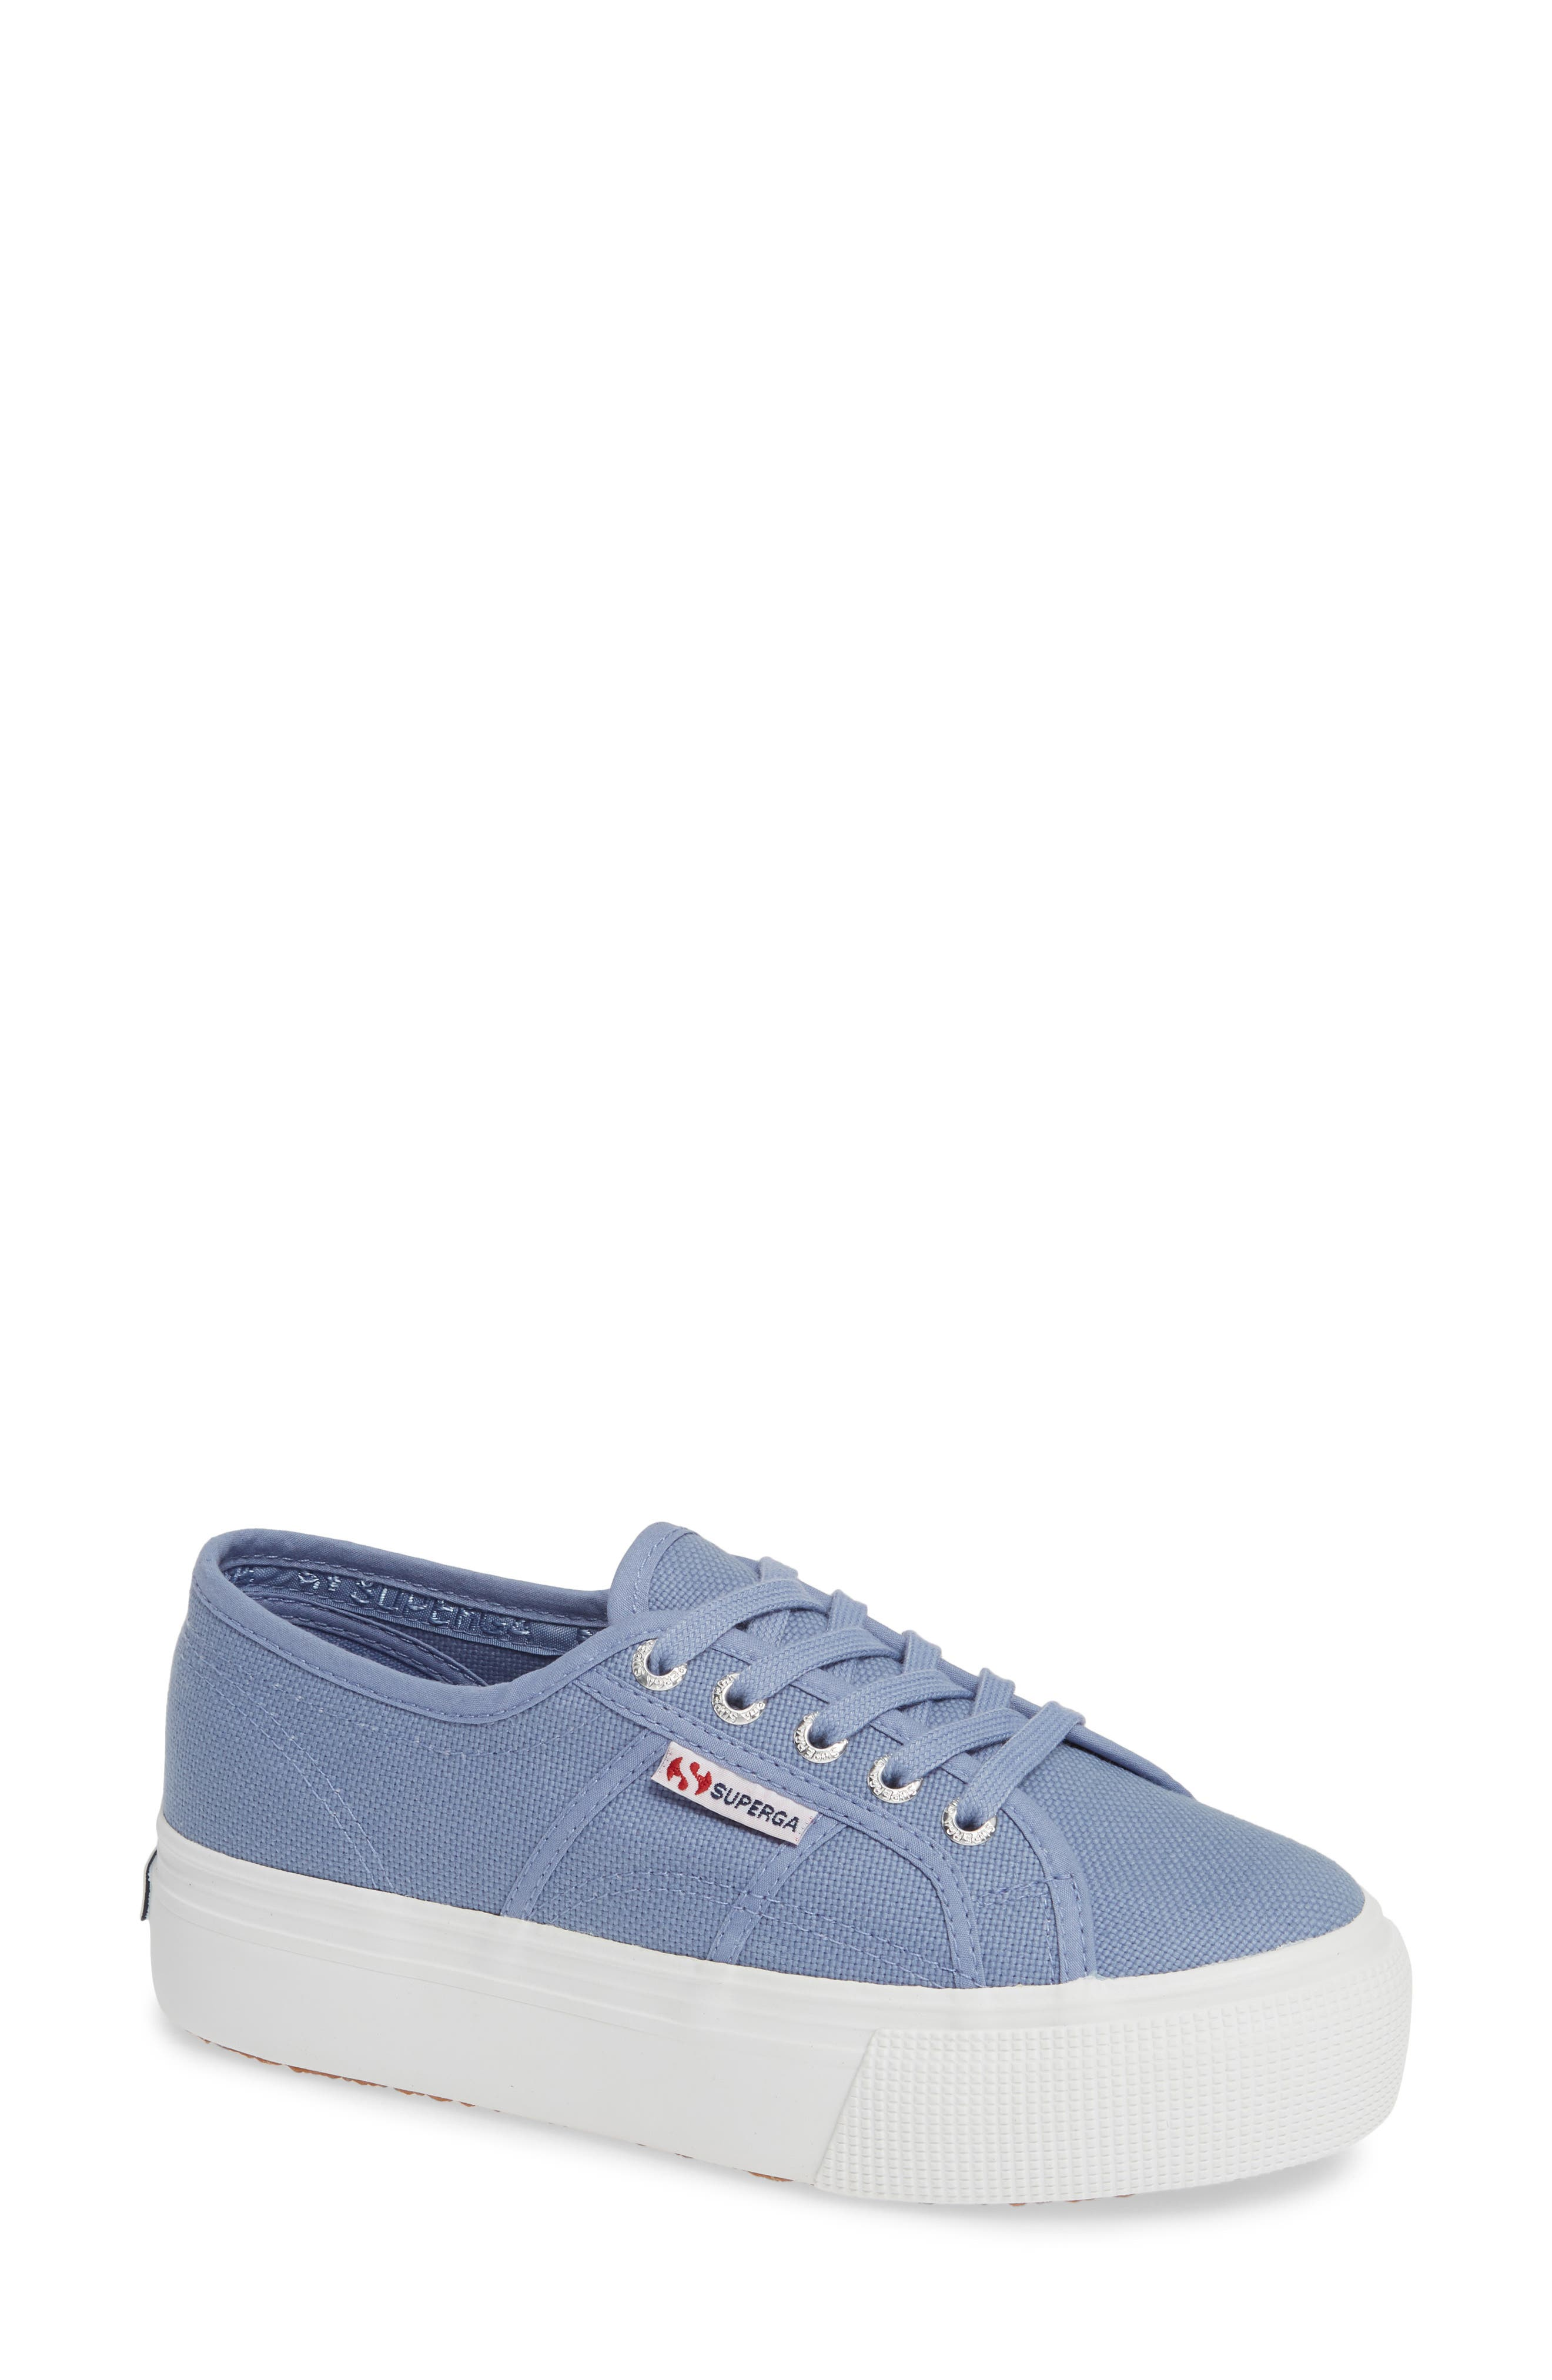 'Acot Linea' Sneaker,                         Main,                         color, BLUE/ LIGHT PURPLE